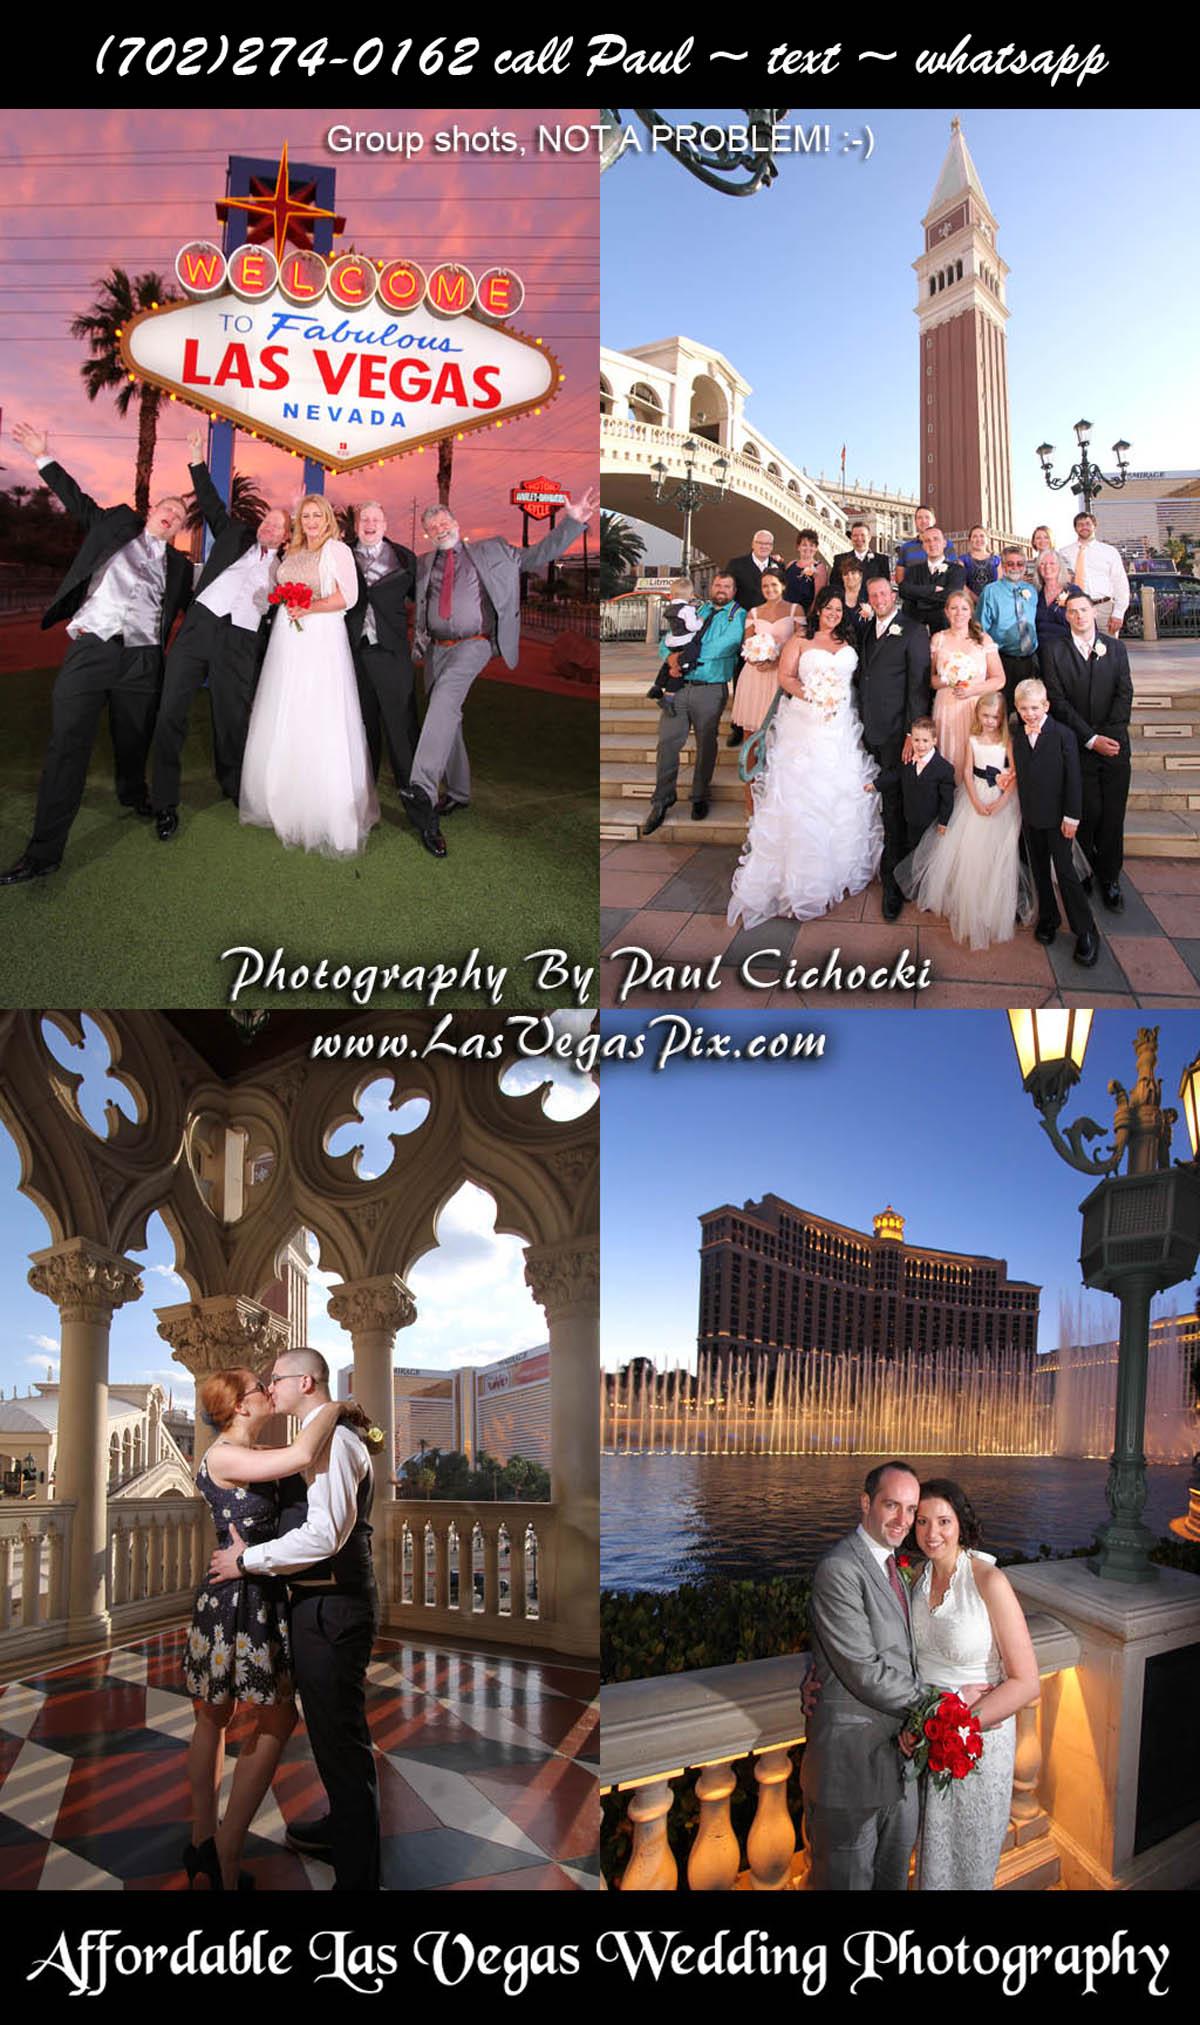 Las Vegas Wedding Photographer Paul C LasVegasPix Affordable Las Vegas Wedding Photography